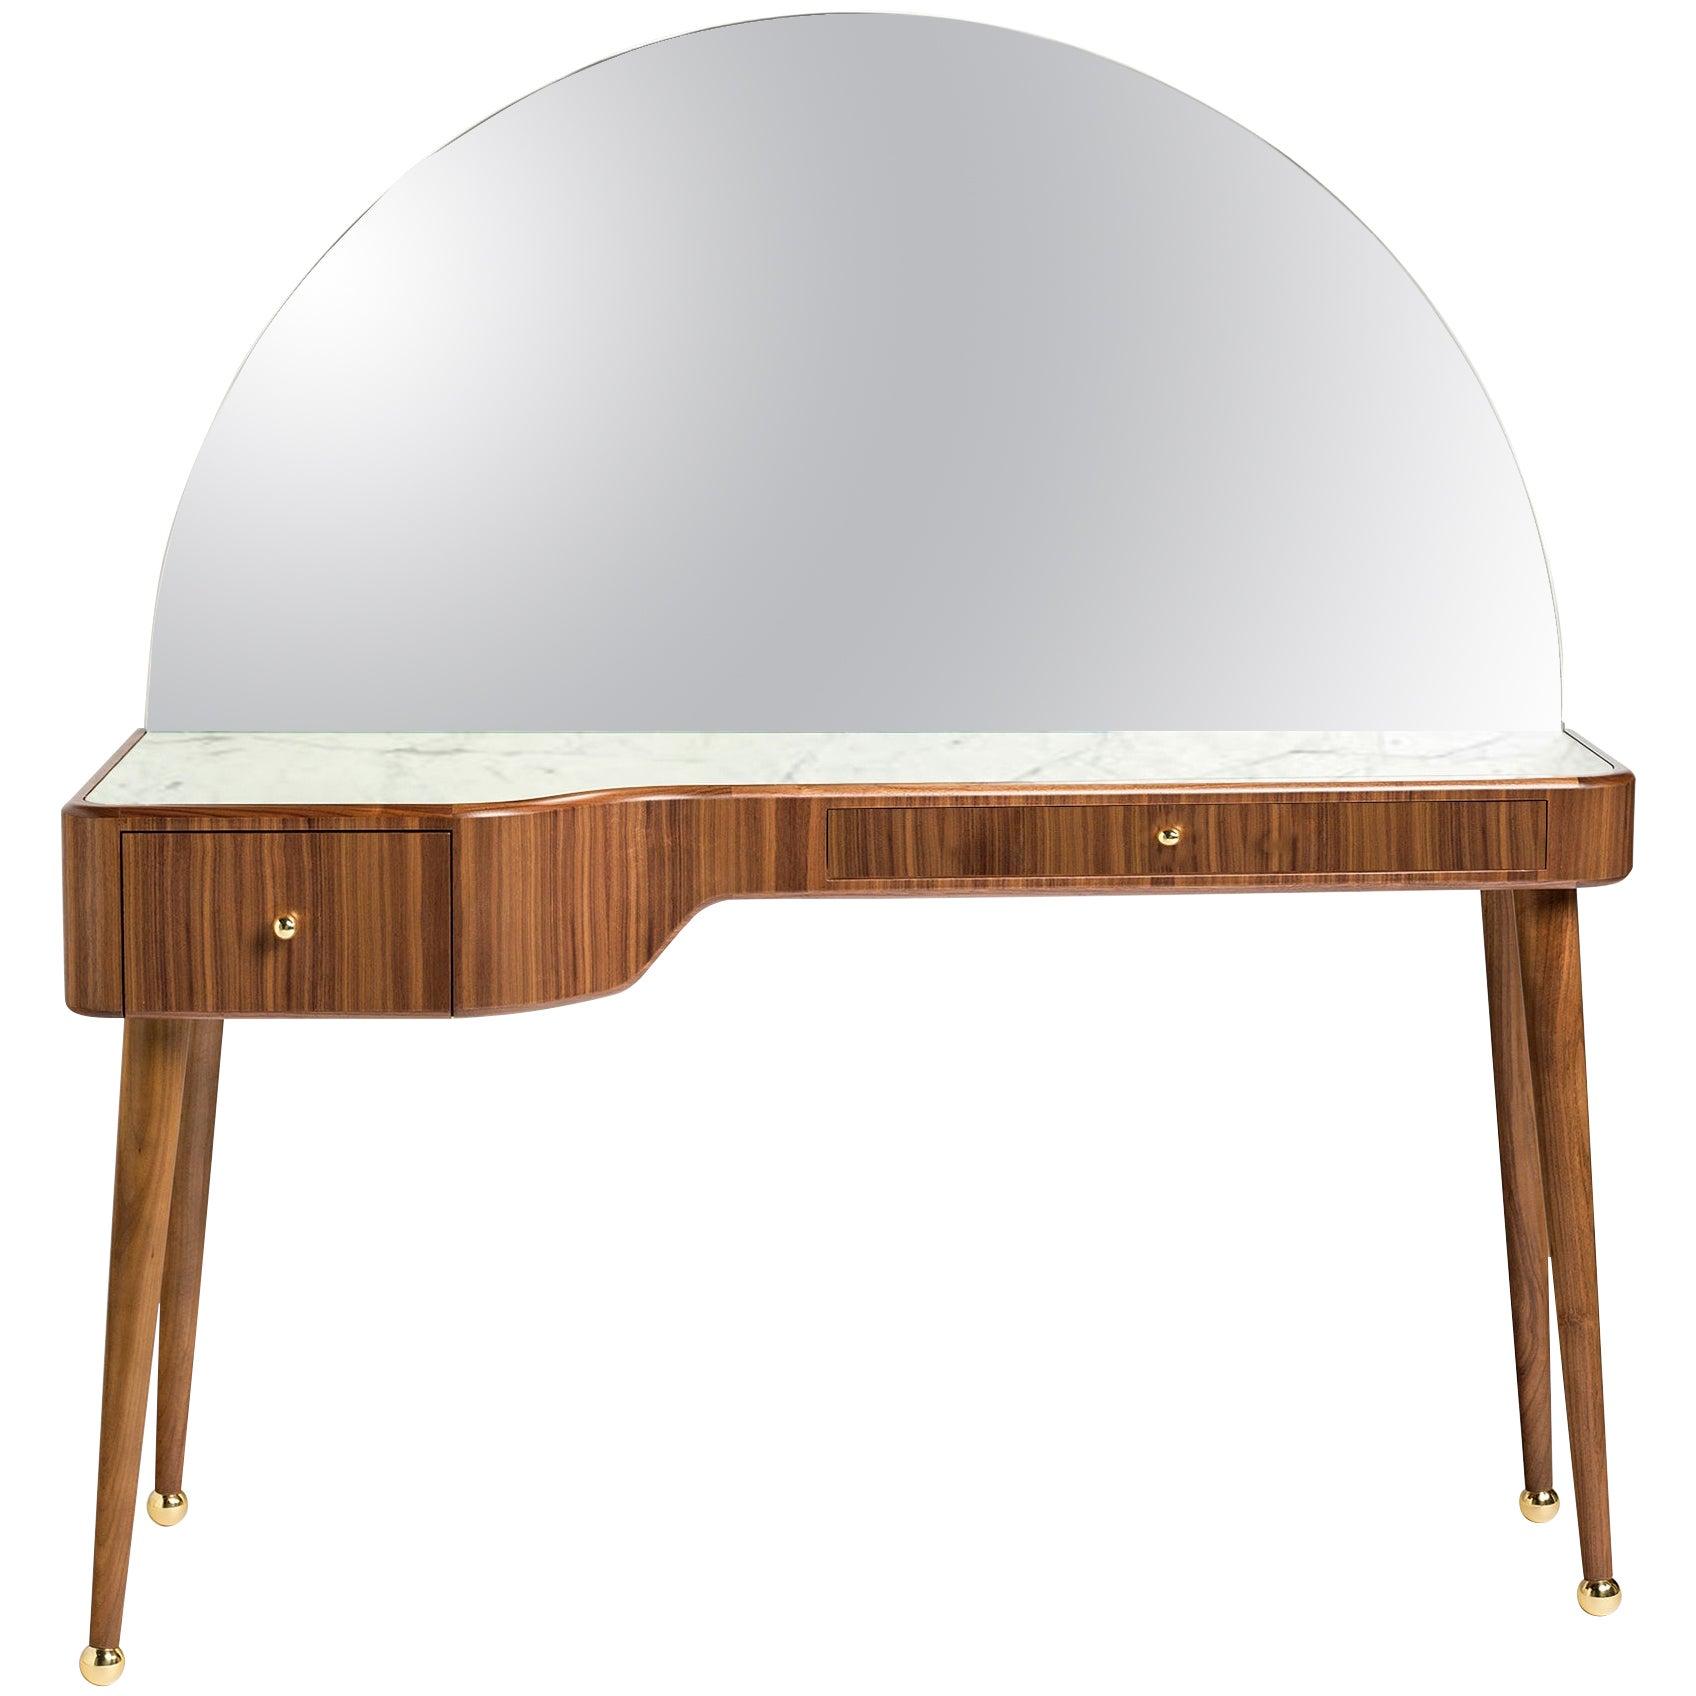 21st Century American Walnut Veneer Vanity Desk with Mirror and Carrara Marble